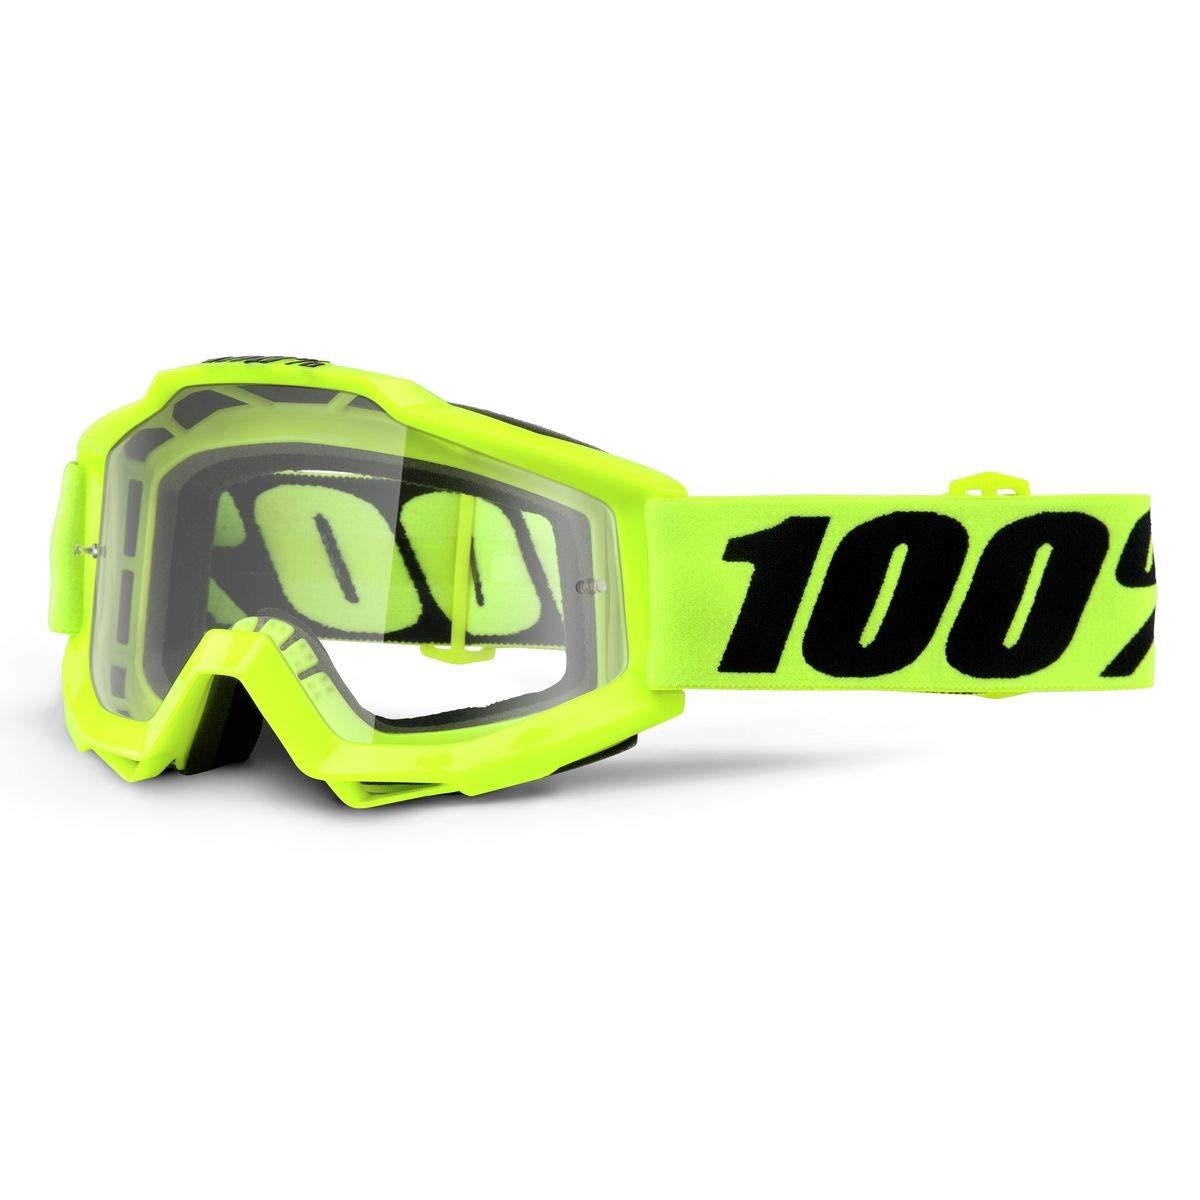 Desconocido 100/% Accuri OTG m/áscara de Bicicleta de monta/ña Unisex Amarillo